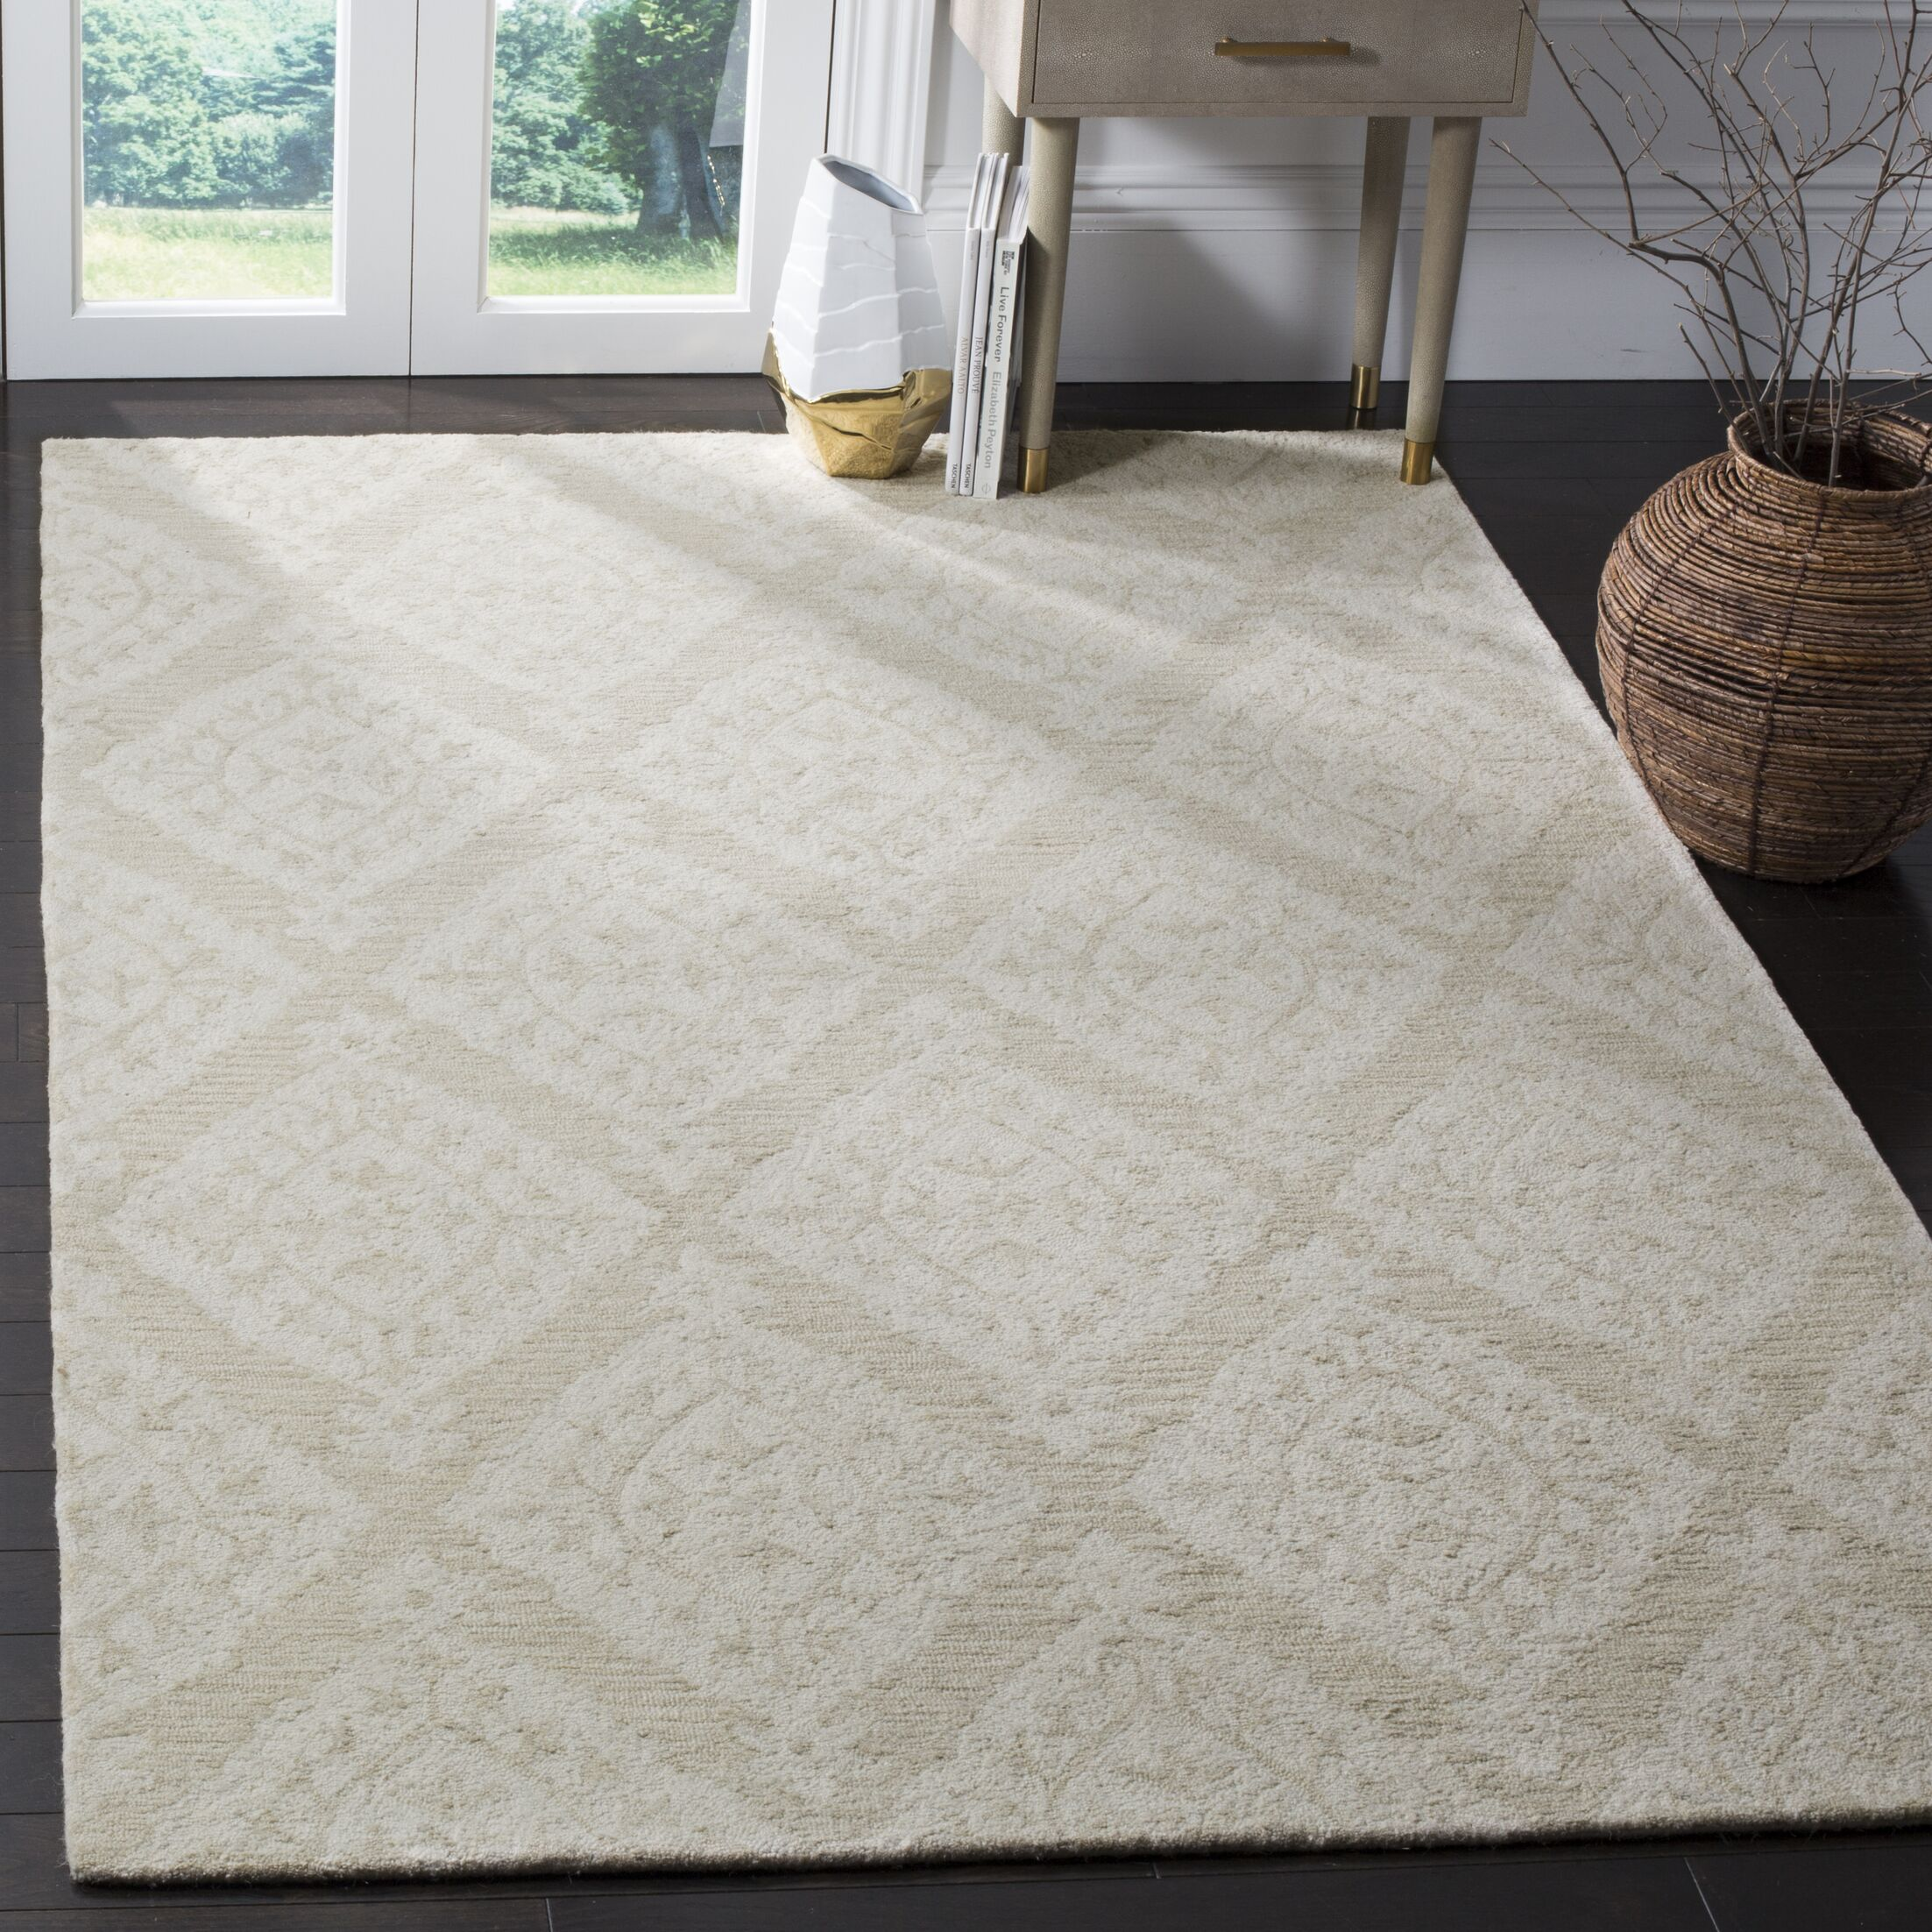 Salerna Hand-Tufted Wool Beige Area Rug Rug Size: Rectangle 4' x 6'